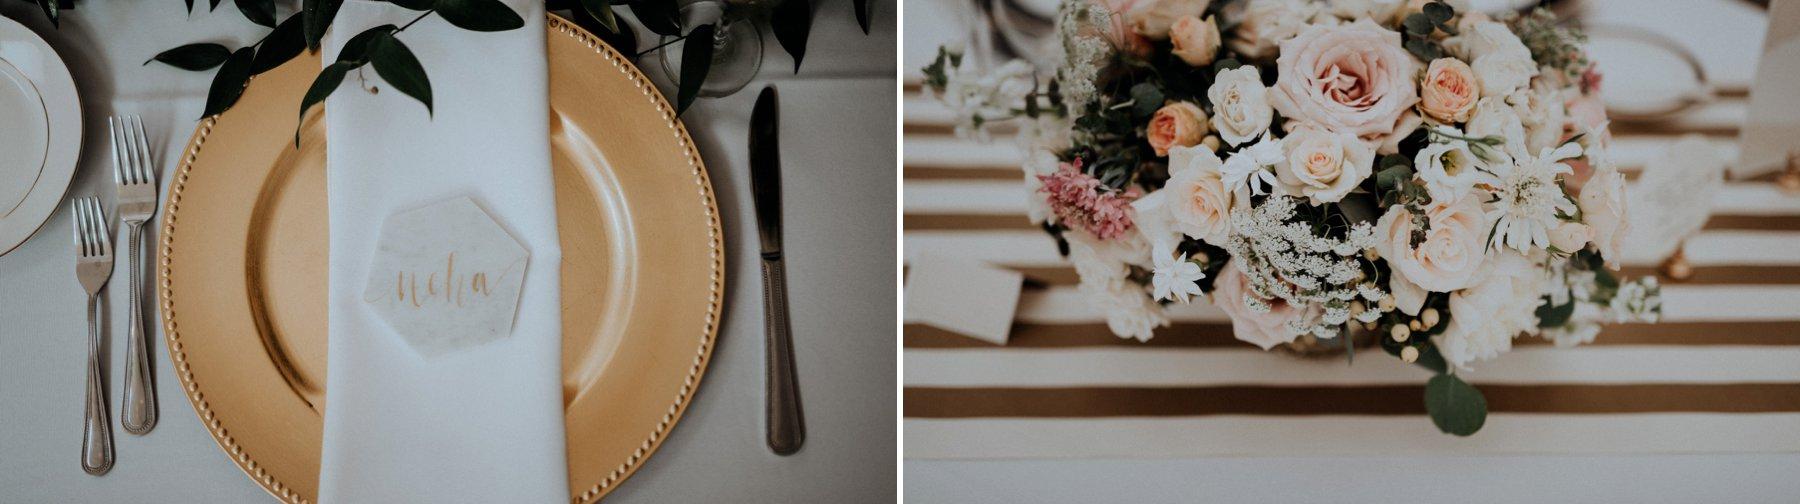 264-265-appleford-estate-wedding-20.jpg